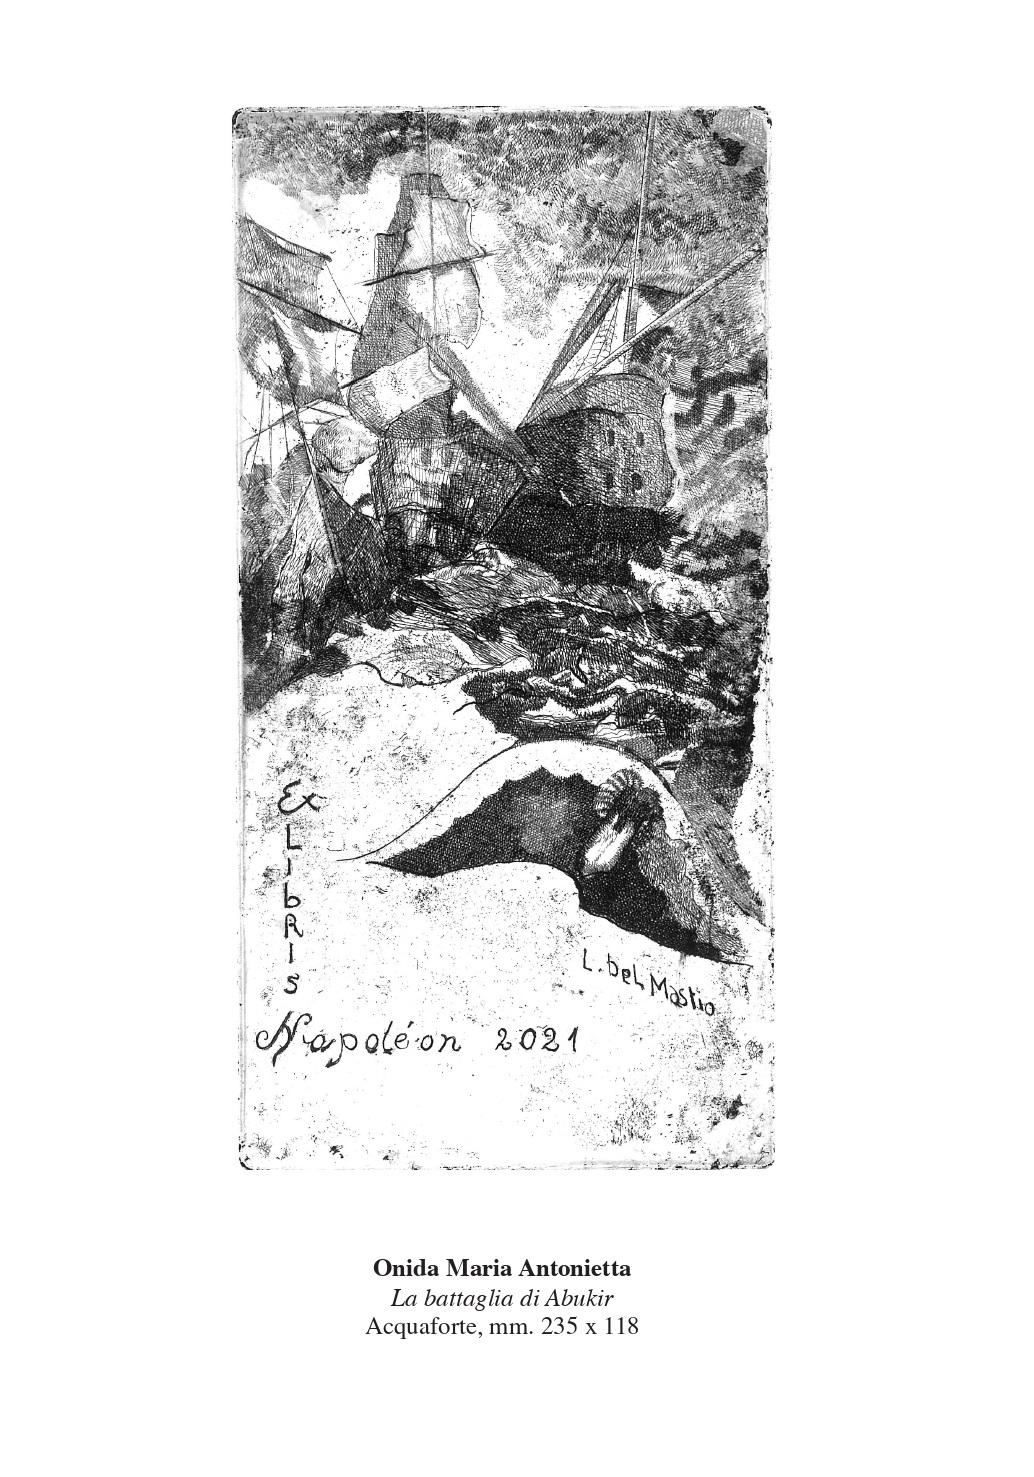 CATALOGO exlibris 2021-111_page-0001